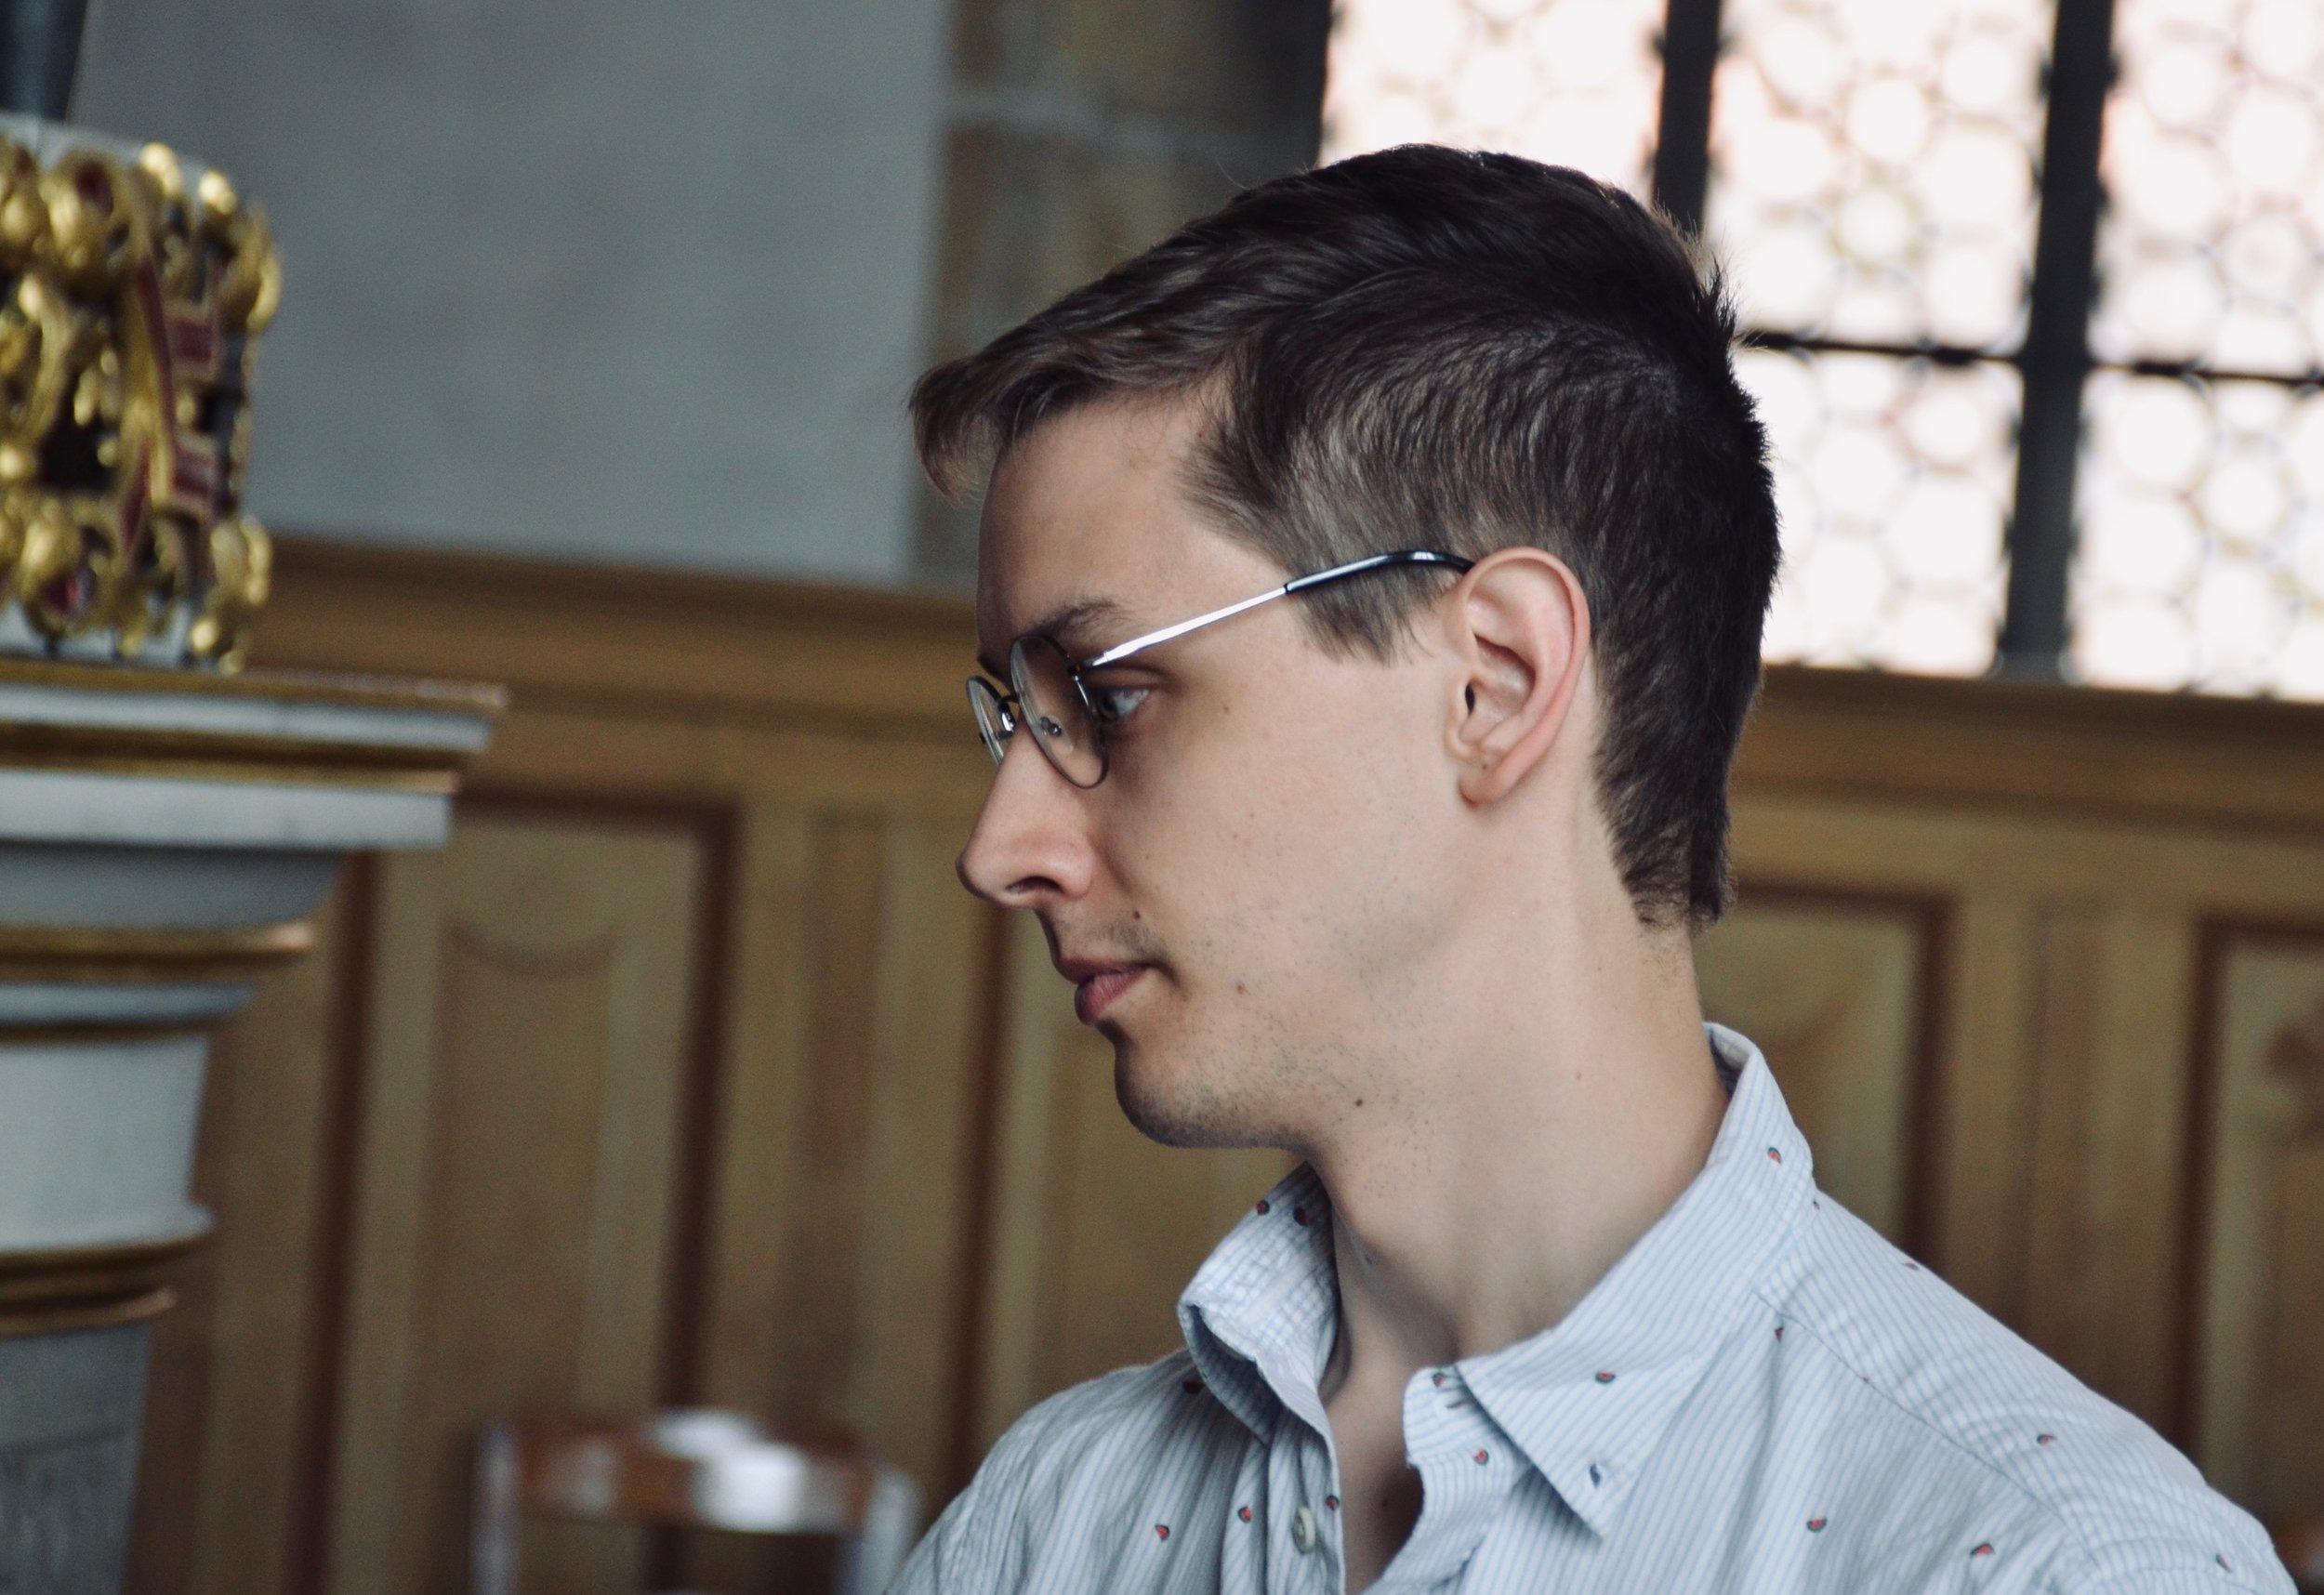 Alex Ross listens to the 1714 Gottfried Silbermann organ in Freiberg Dom.